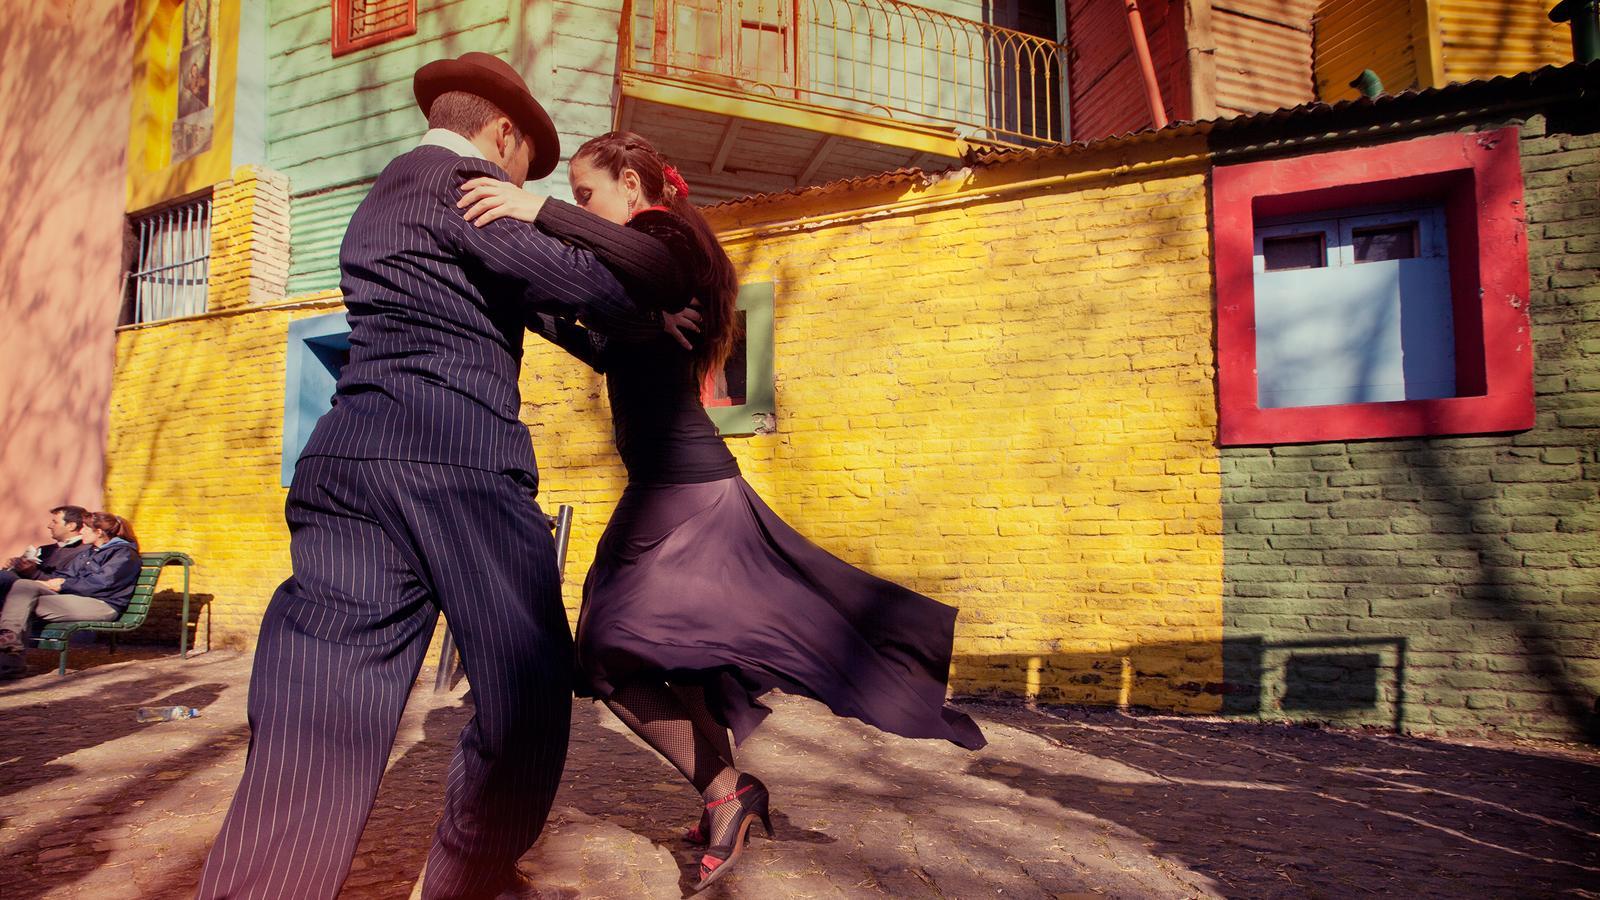 Buenos Aires & Tango Independent Adventure in Argentina